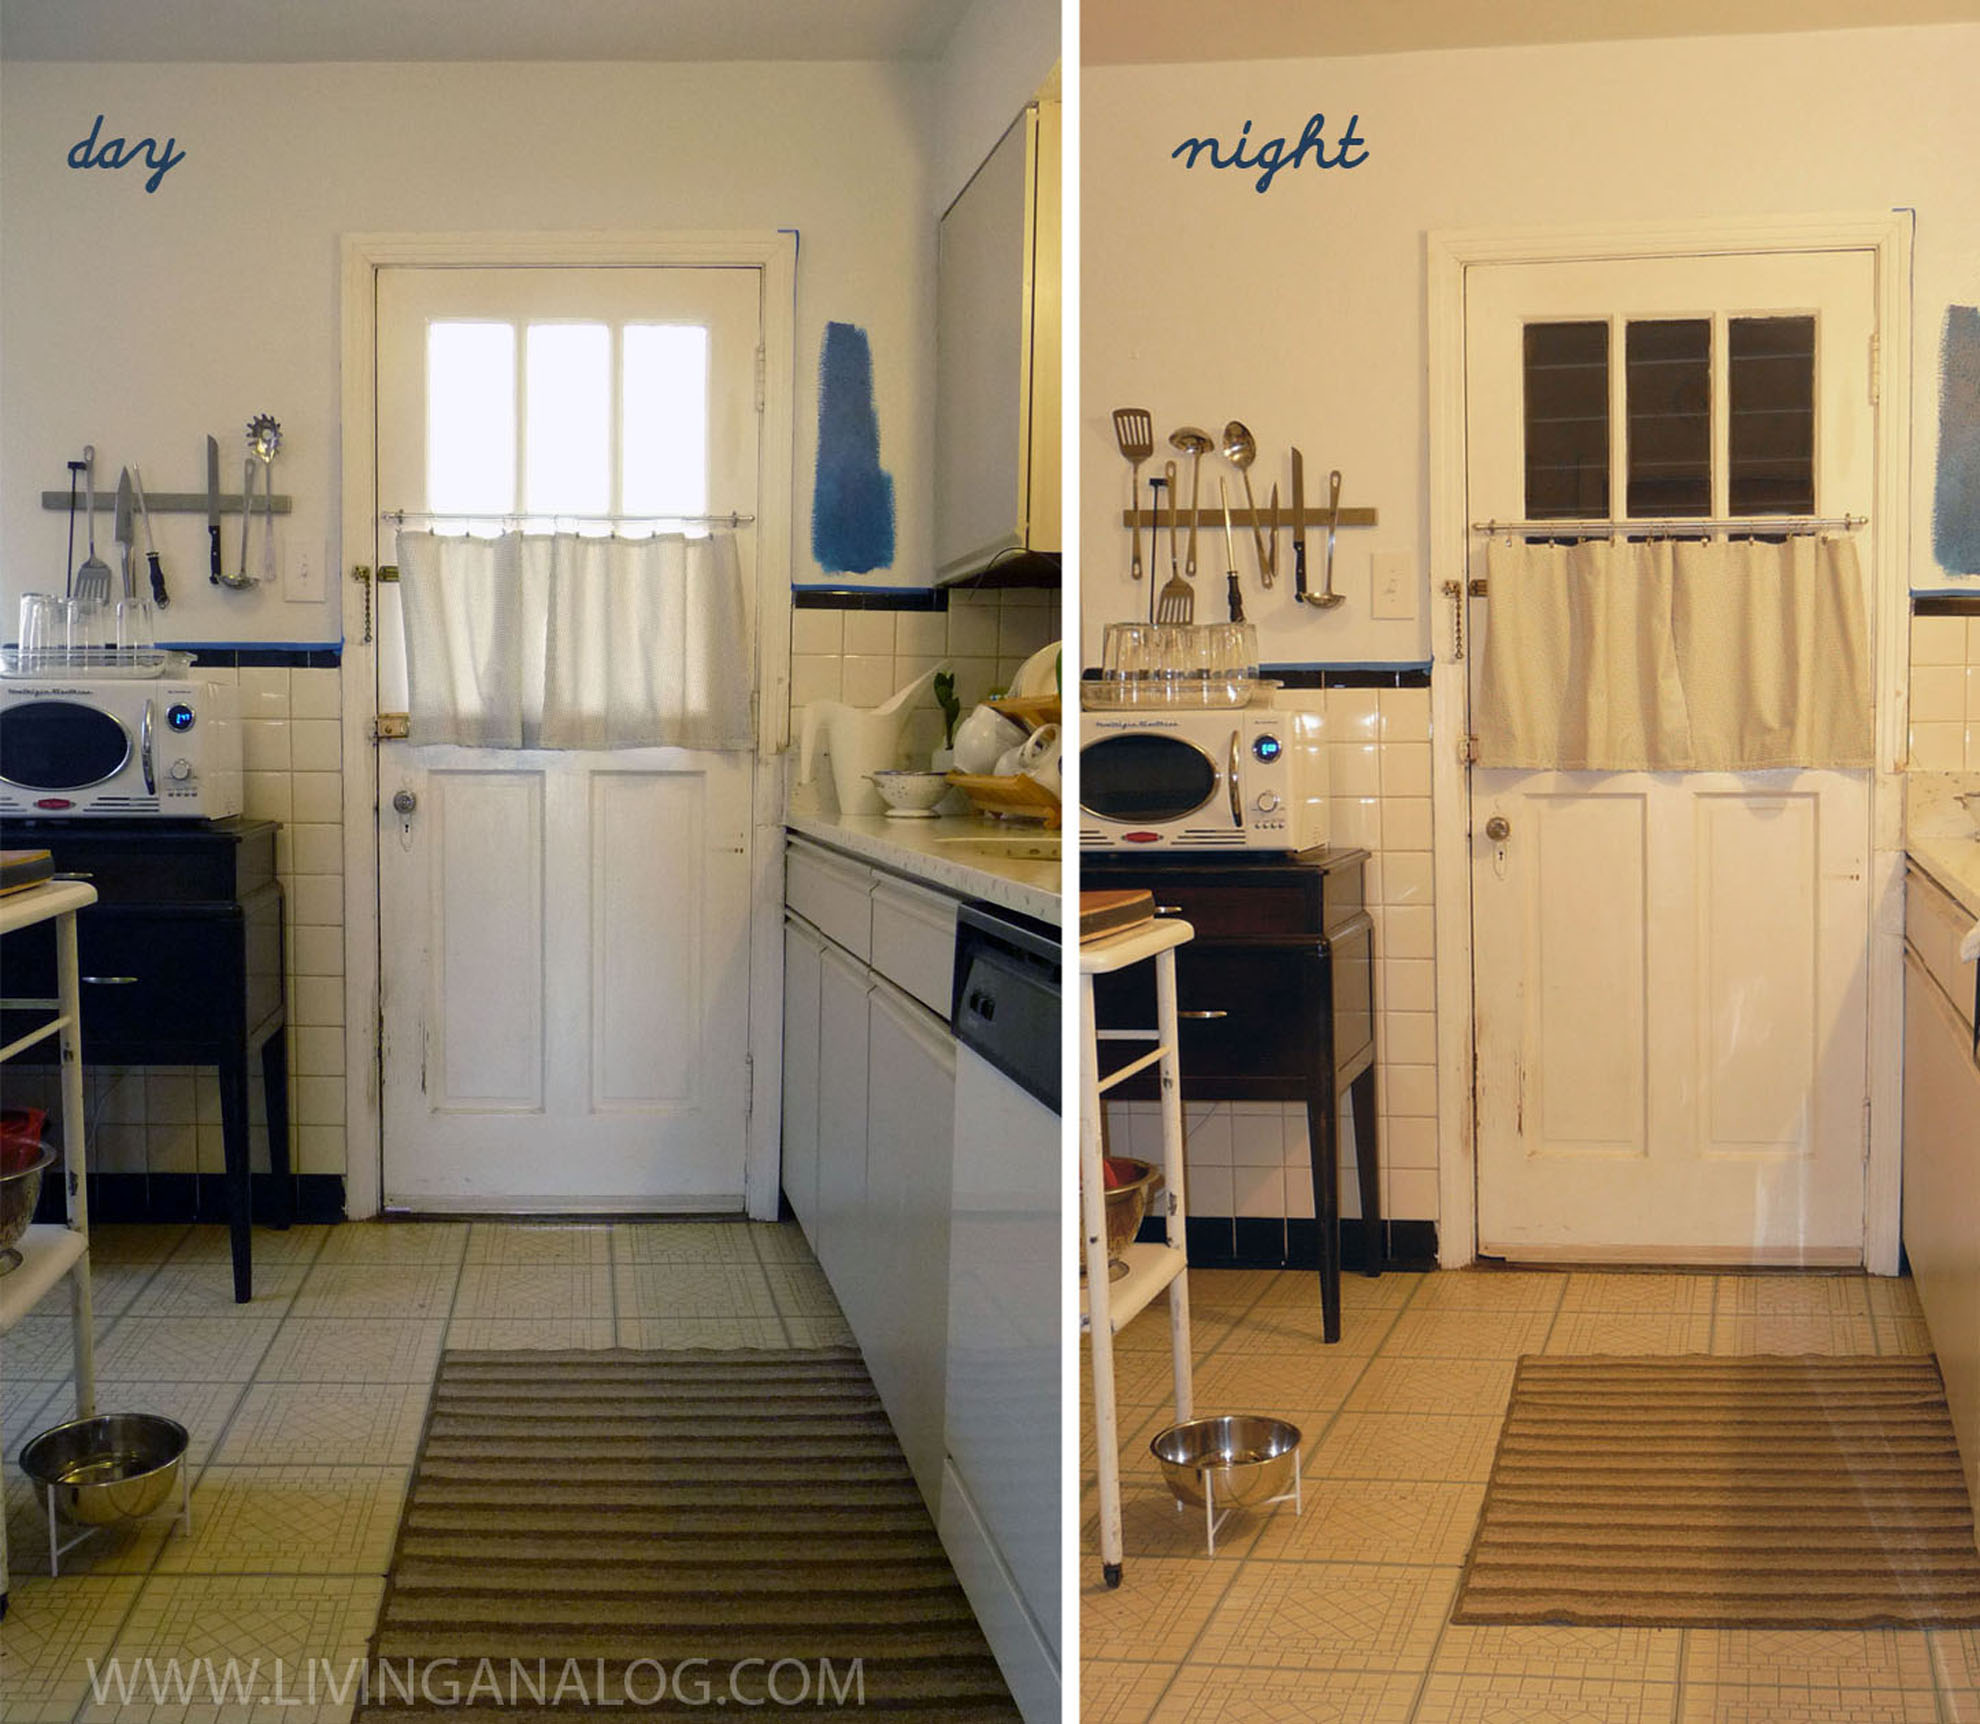 Curtains for kitchen door photo - 3